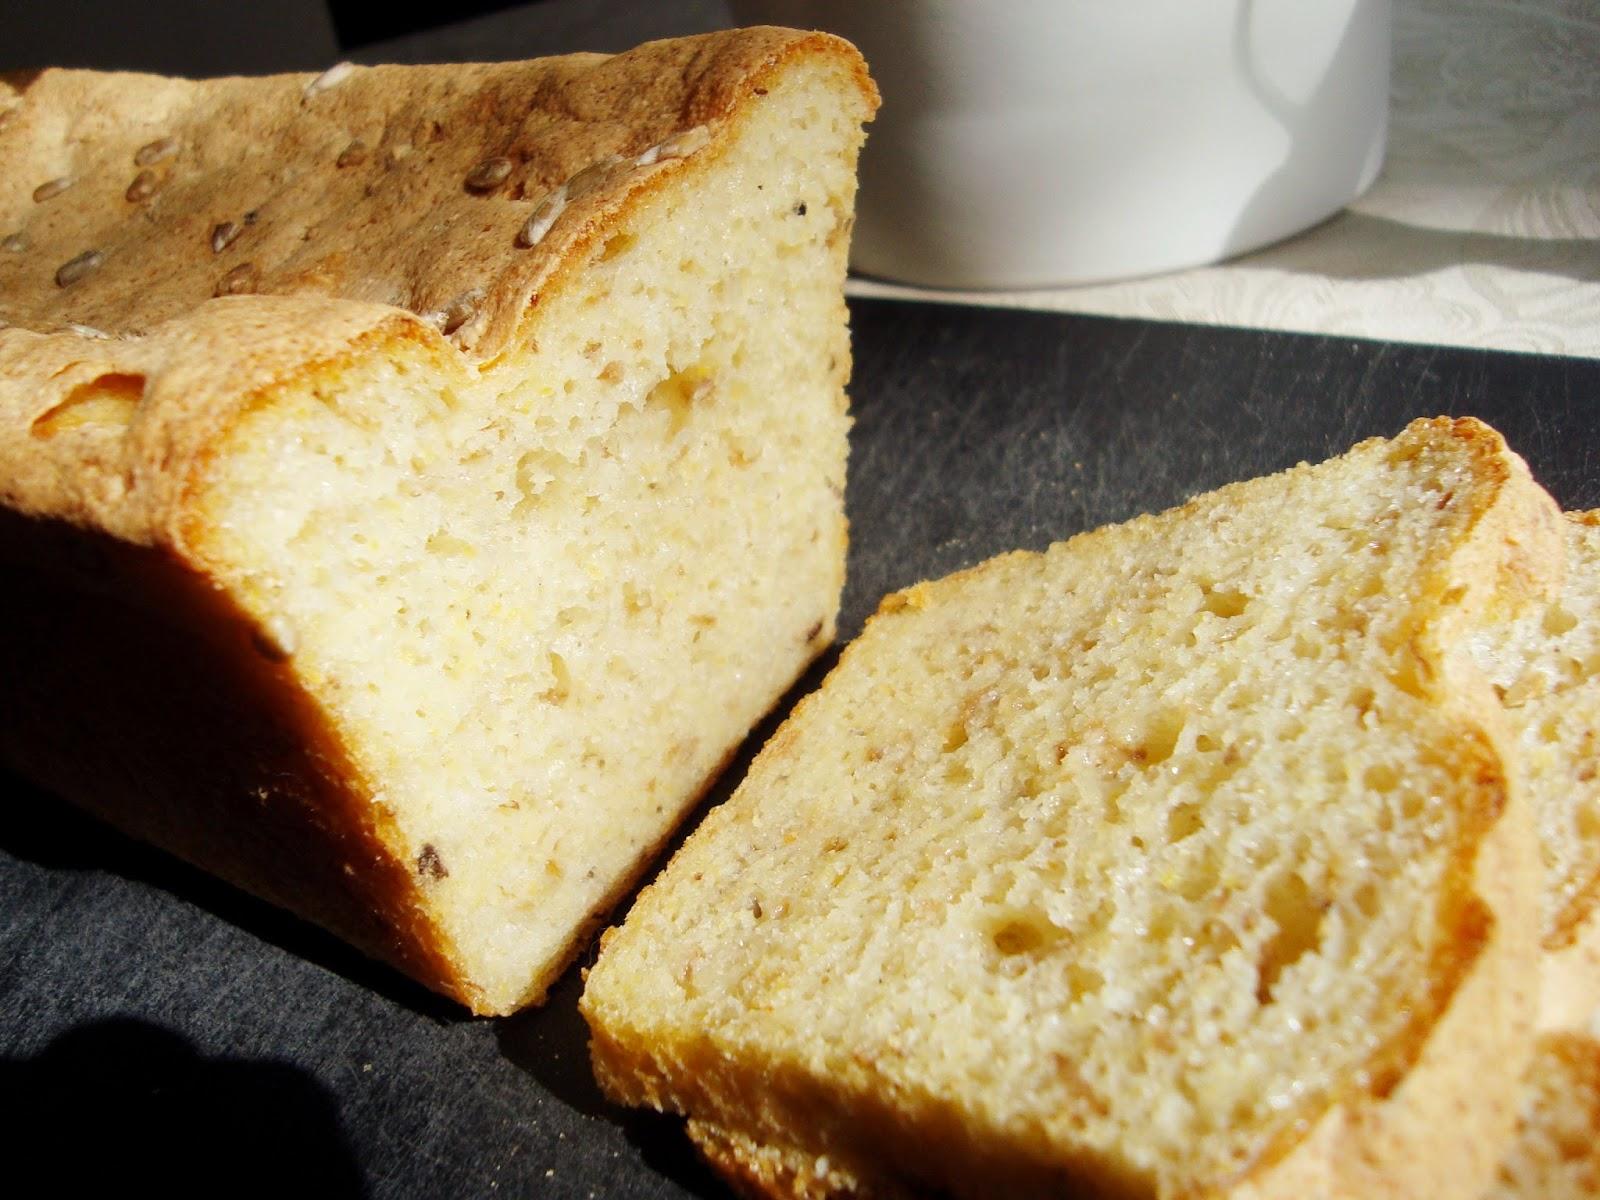 baka bröd med majsmjöl